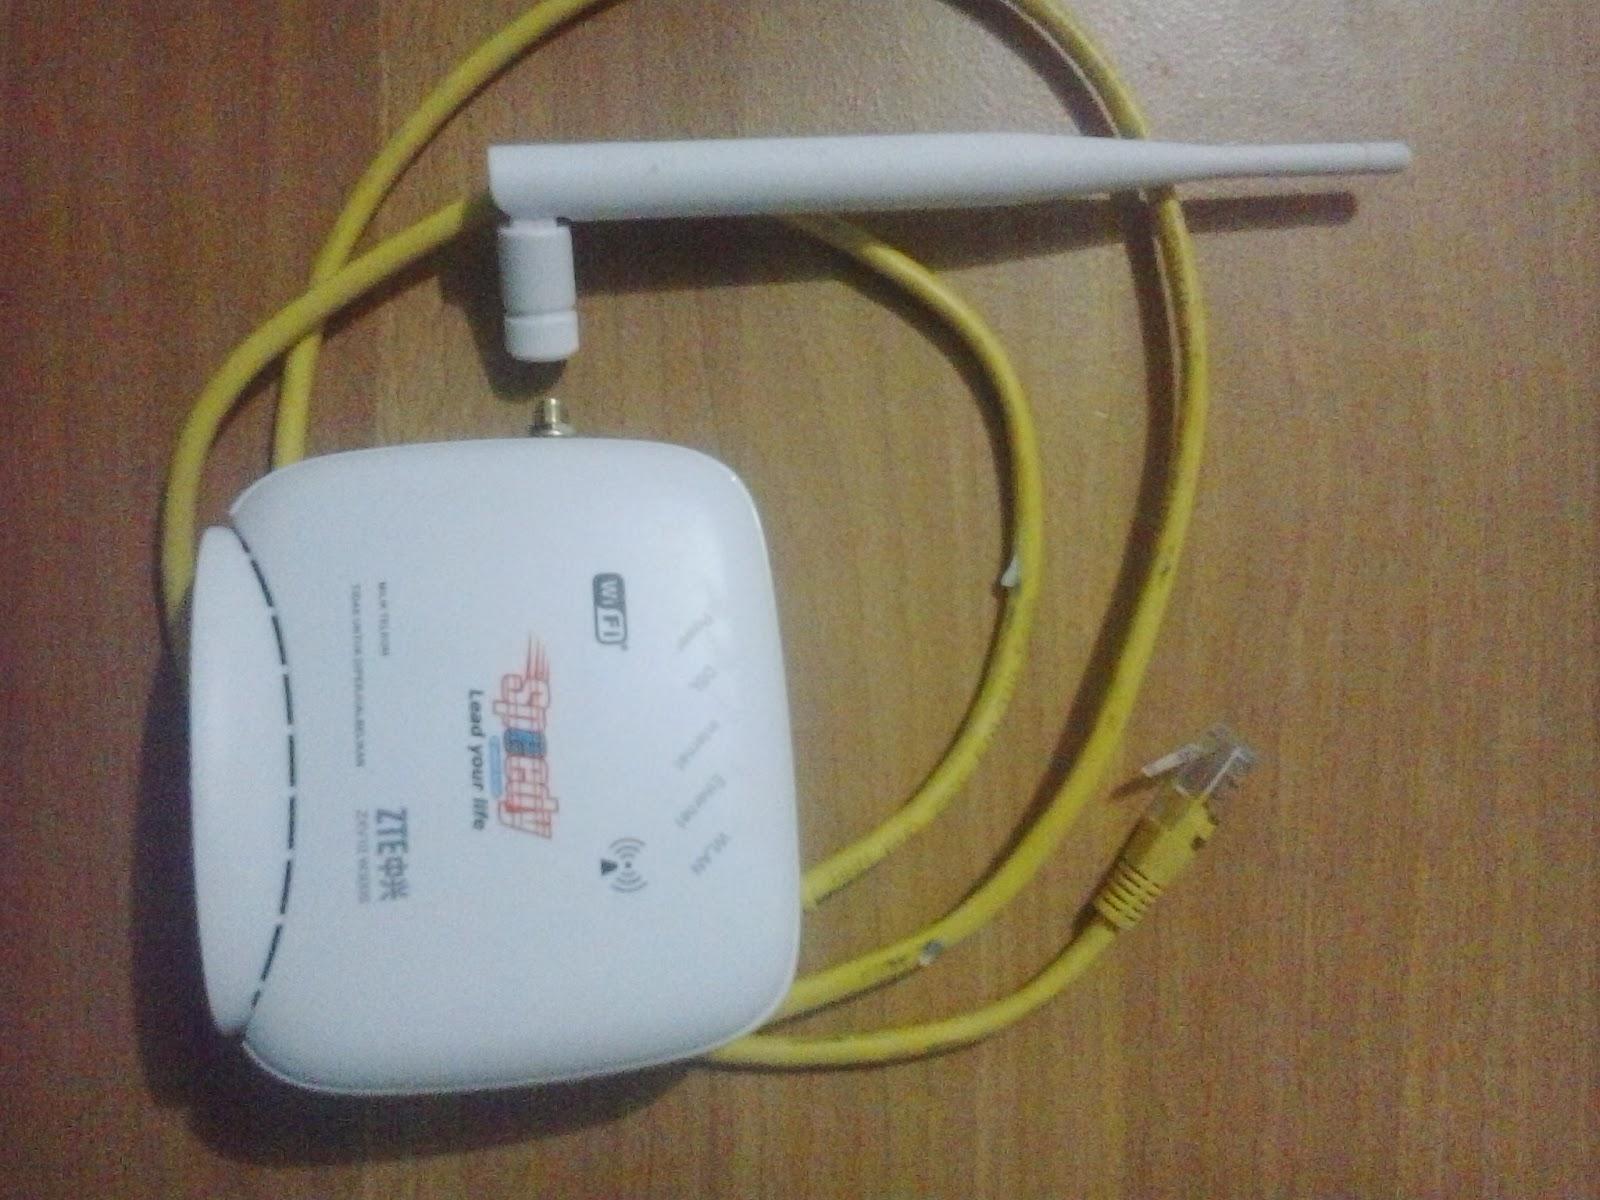 CARA MUDAH SETTING MODEM ADSL